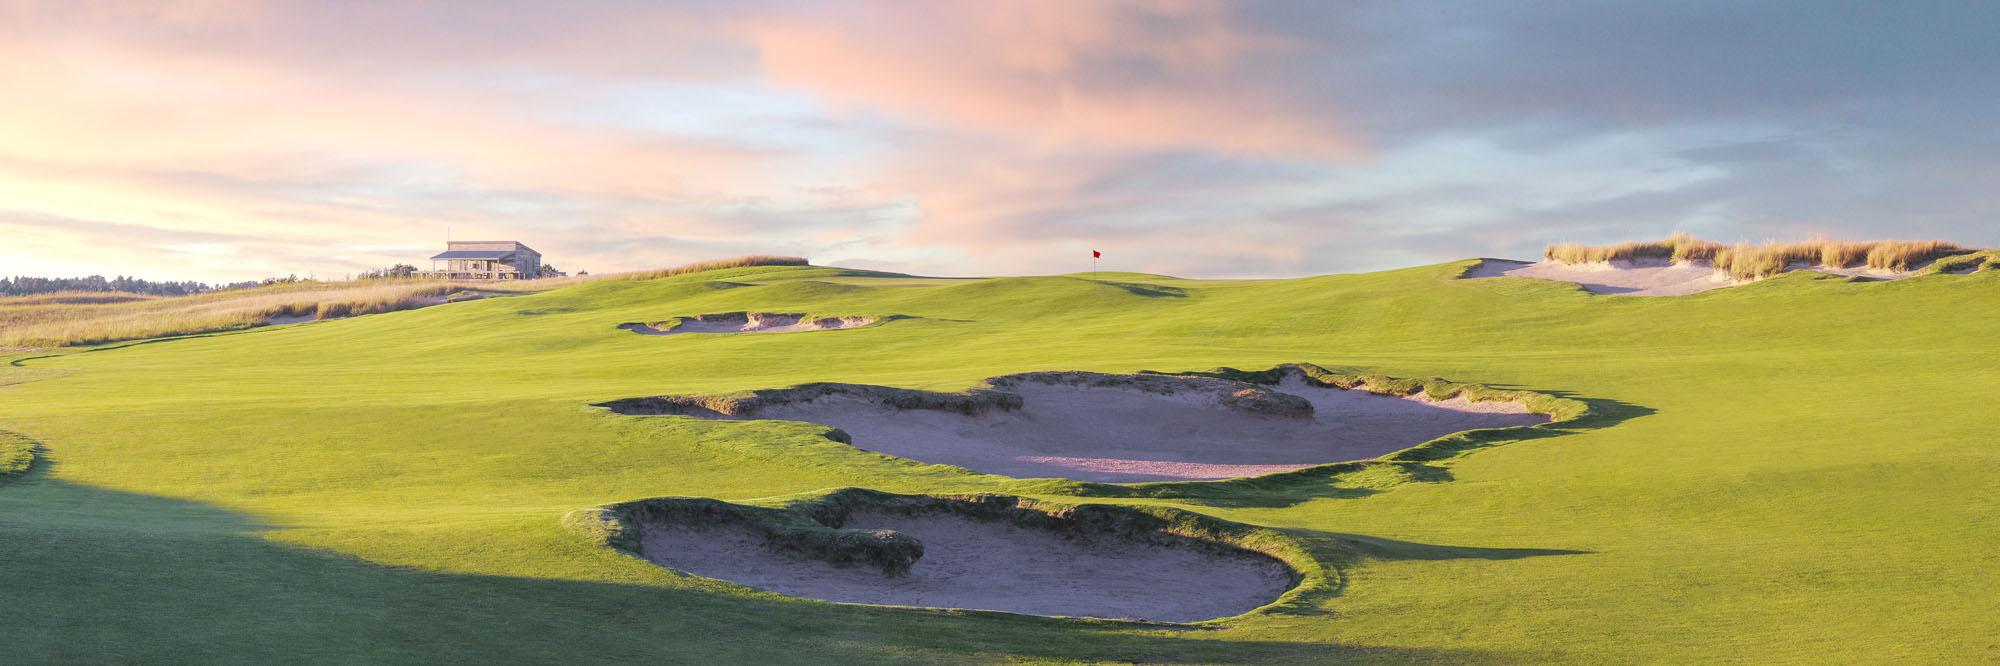 Golf Course Image - The Prairie Club Dunes No. 9